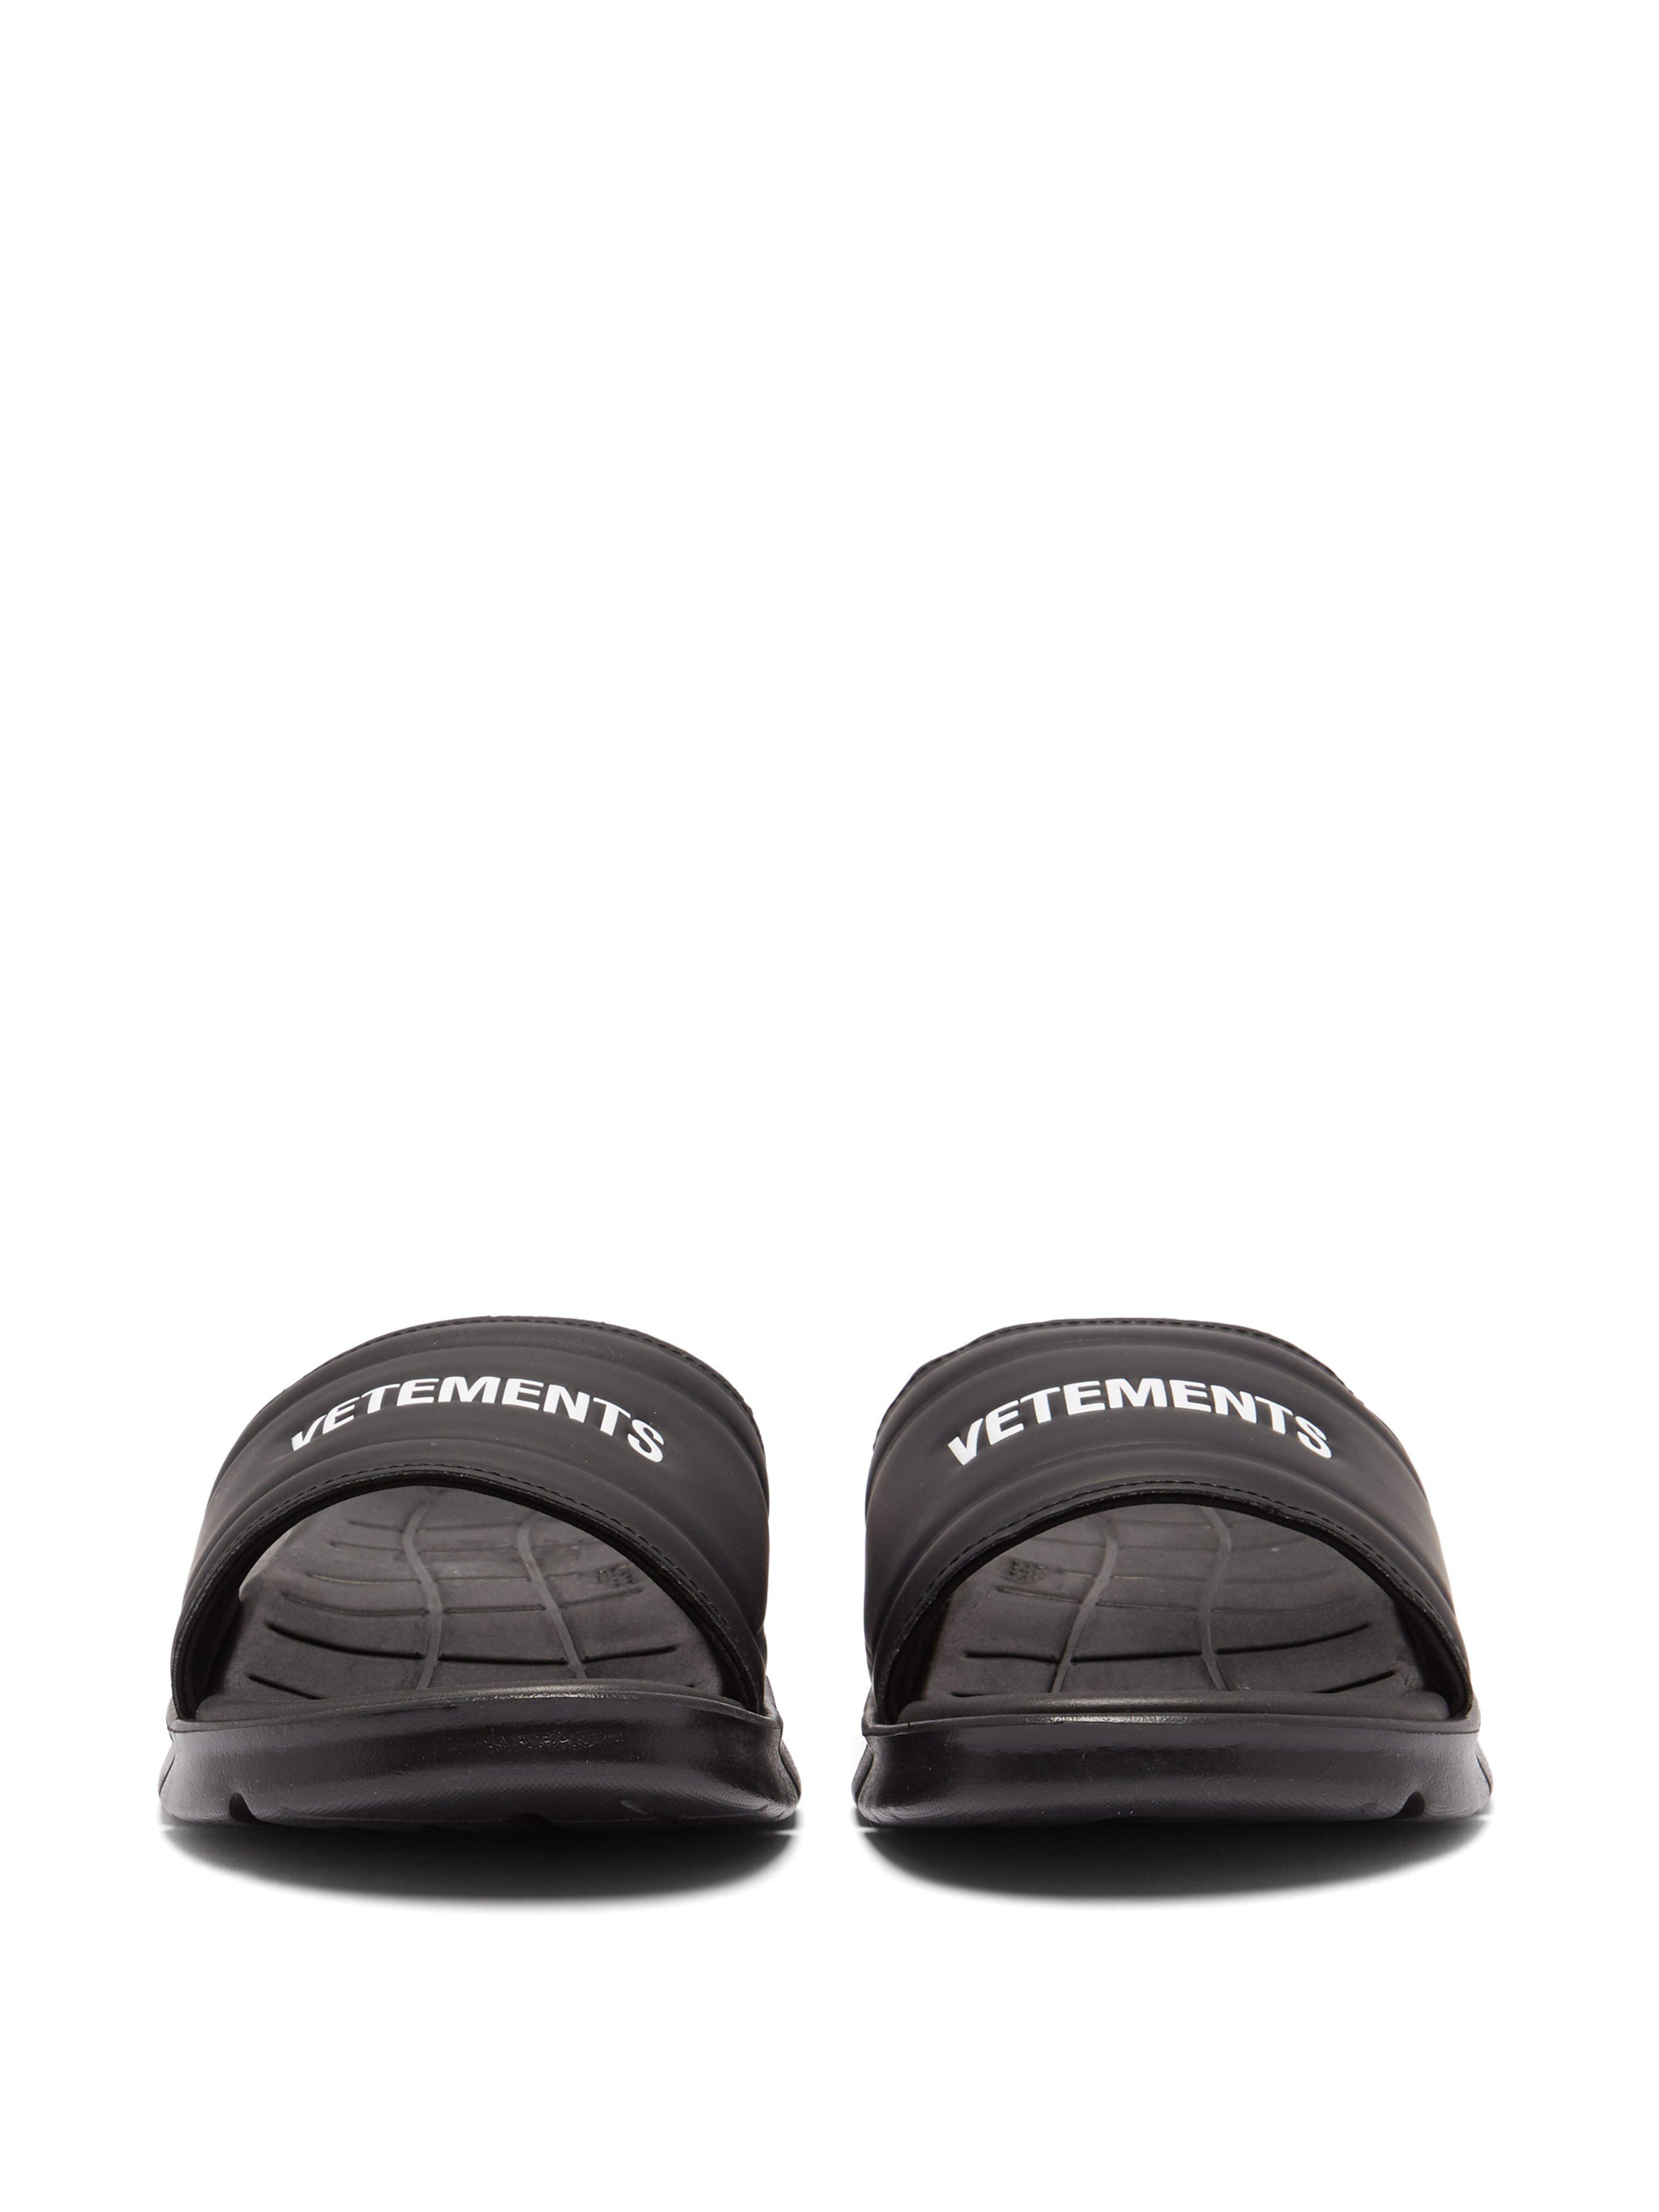 d63cf103a68 Vetements - Black X Reebok Logo Slides - Lyst. View fullscreen